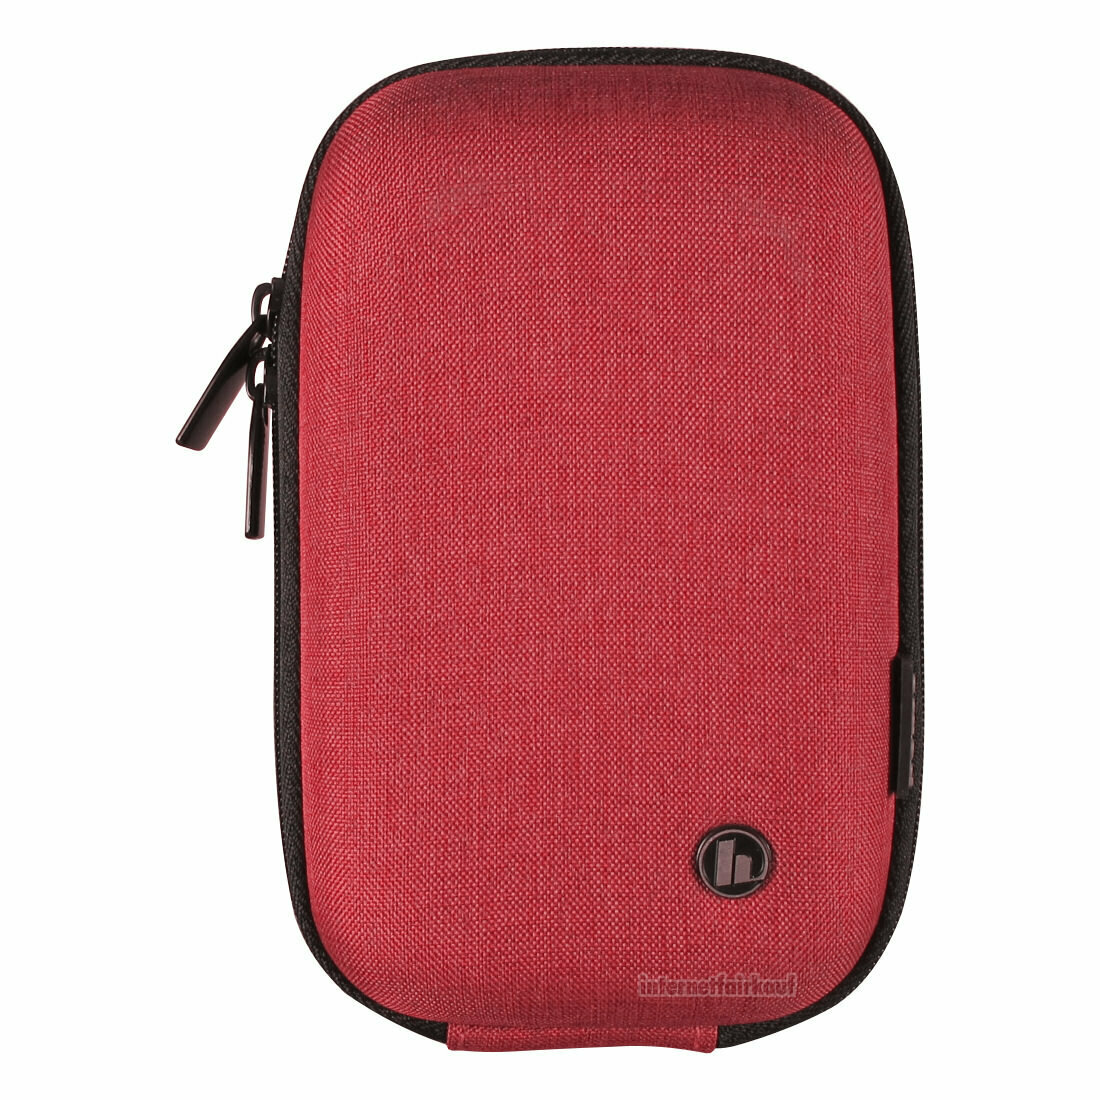 Hardcase Kamera-Tasche rot passend für Olympus Tough TG-3 TG-4 TG-5 TG-6